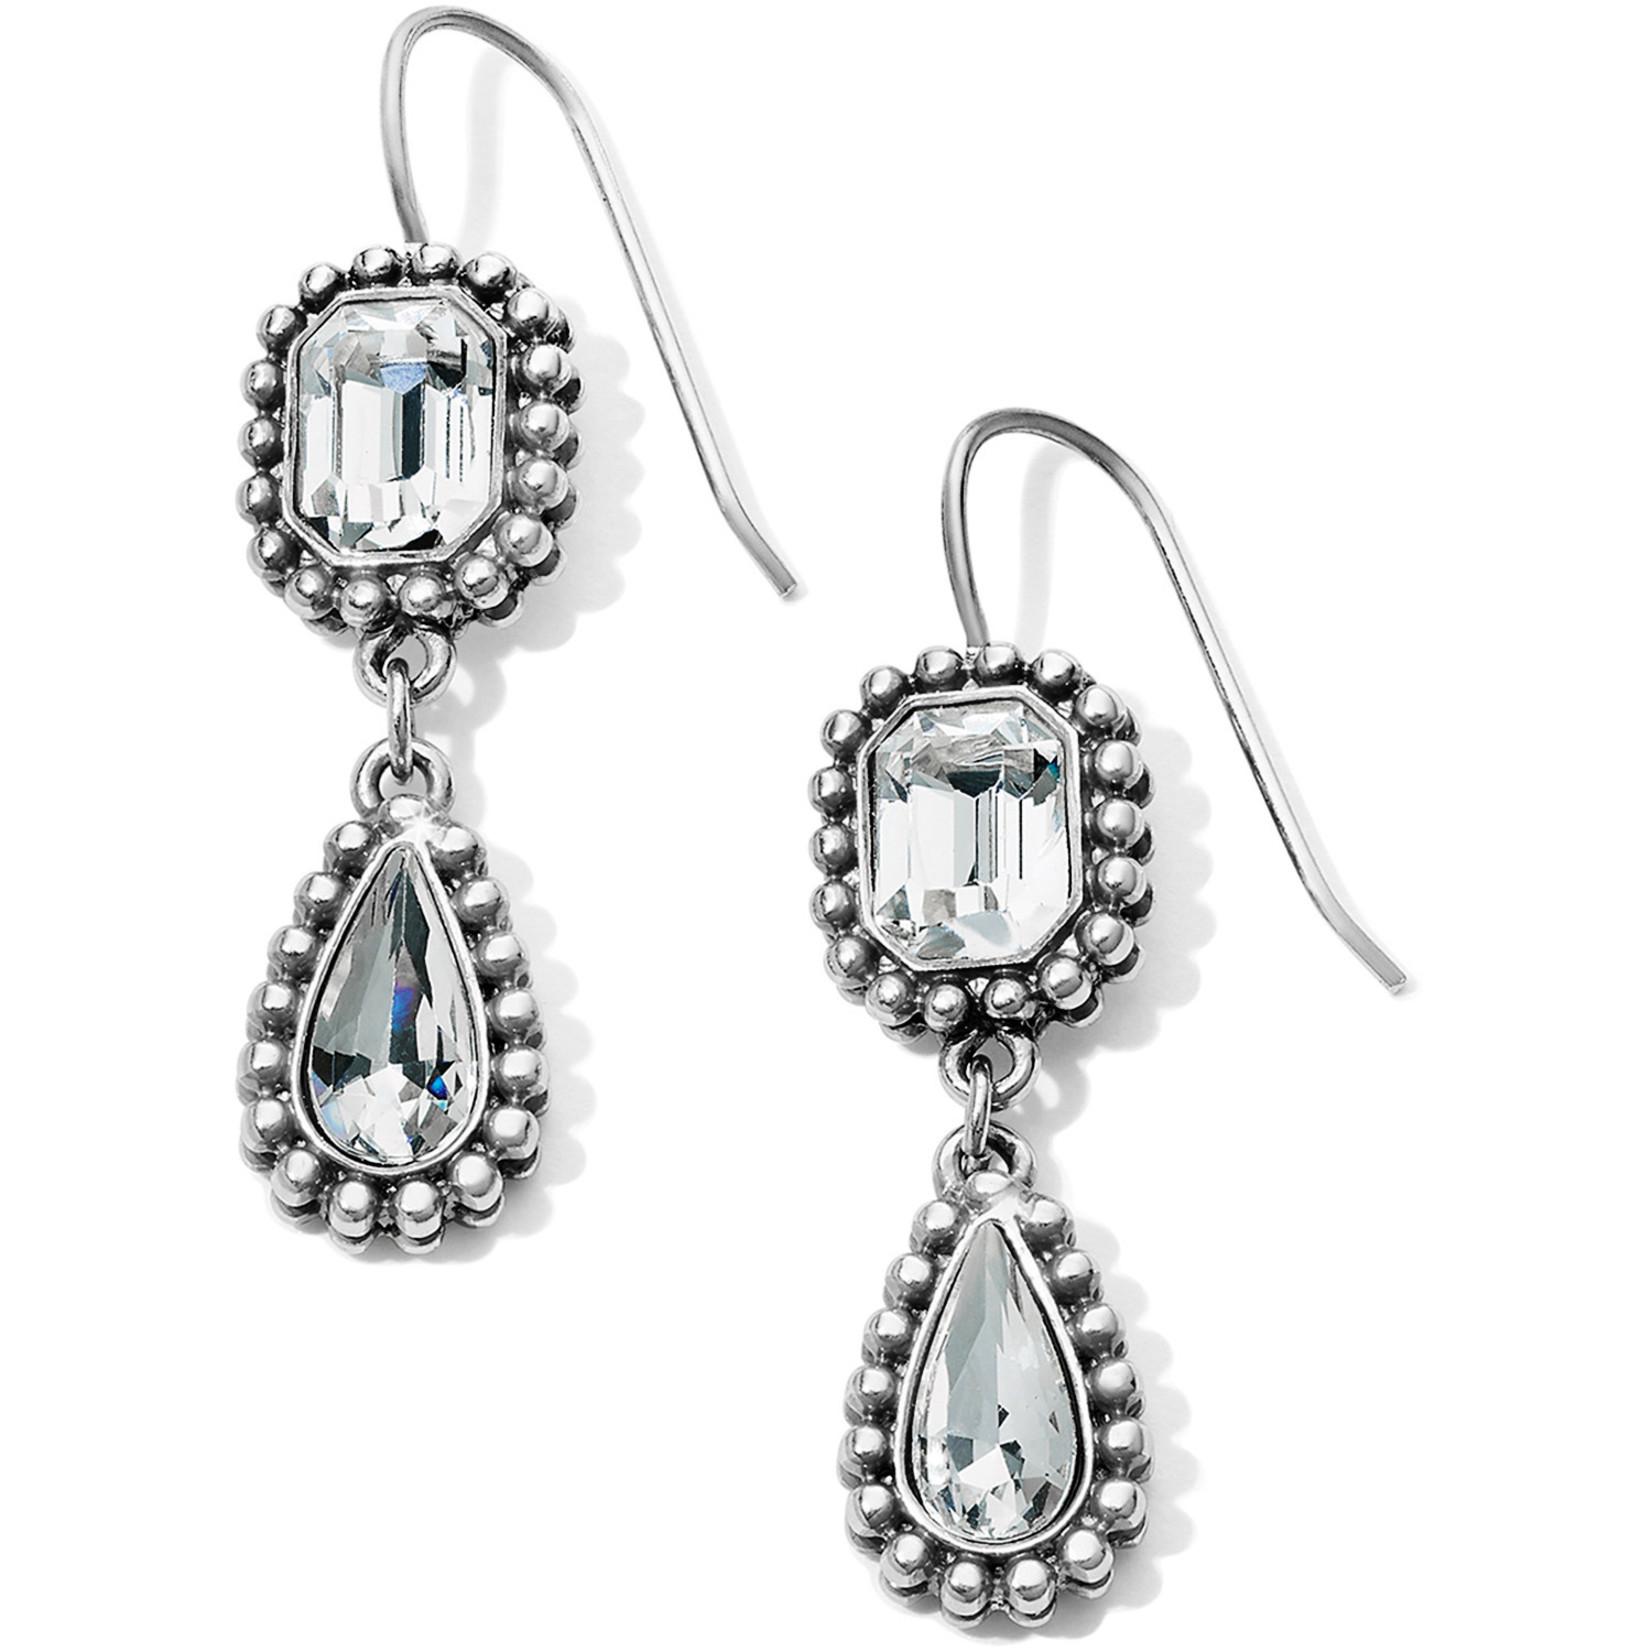 Brighton Twinkle Elite French Wire Earrings